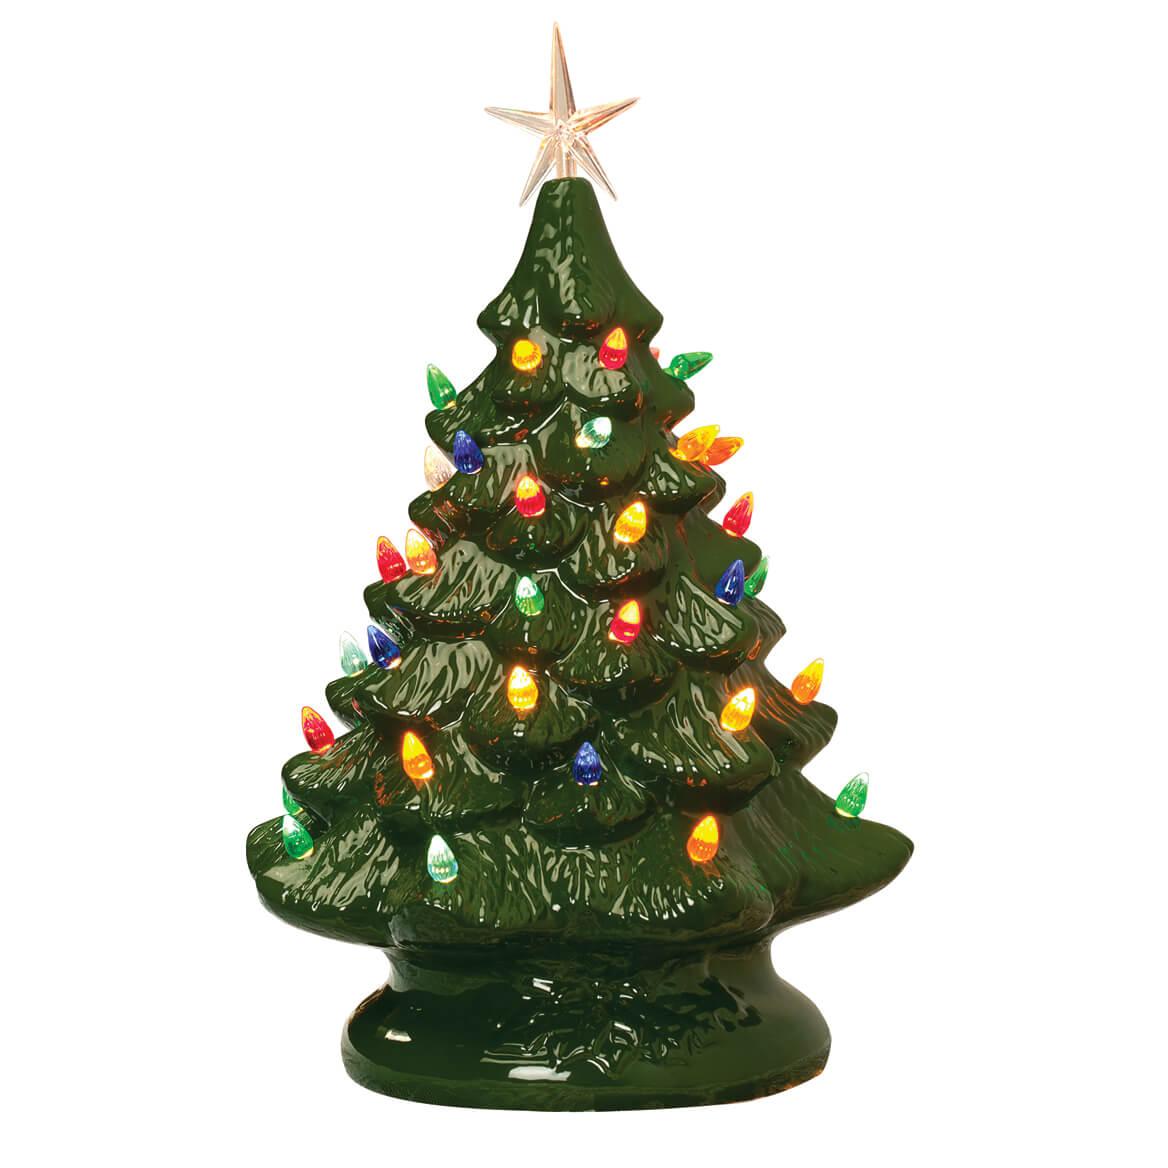 The Christmas Trees: Christmas Tree Bubble Lights